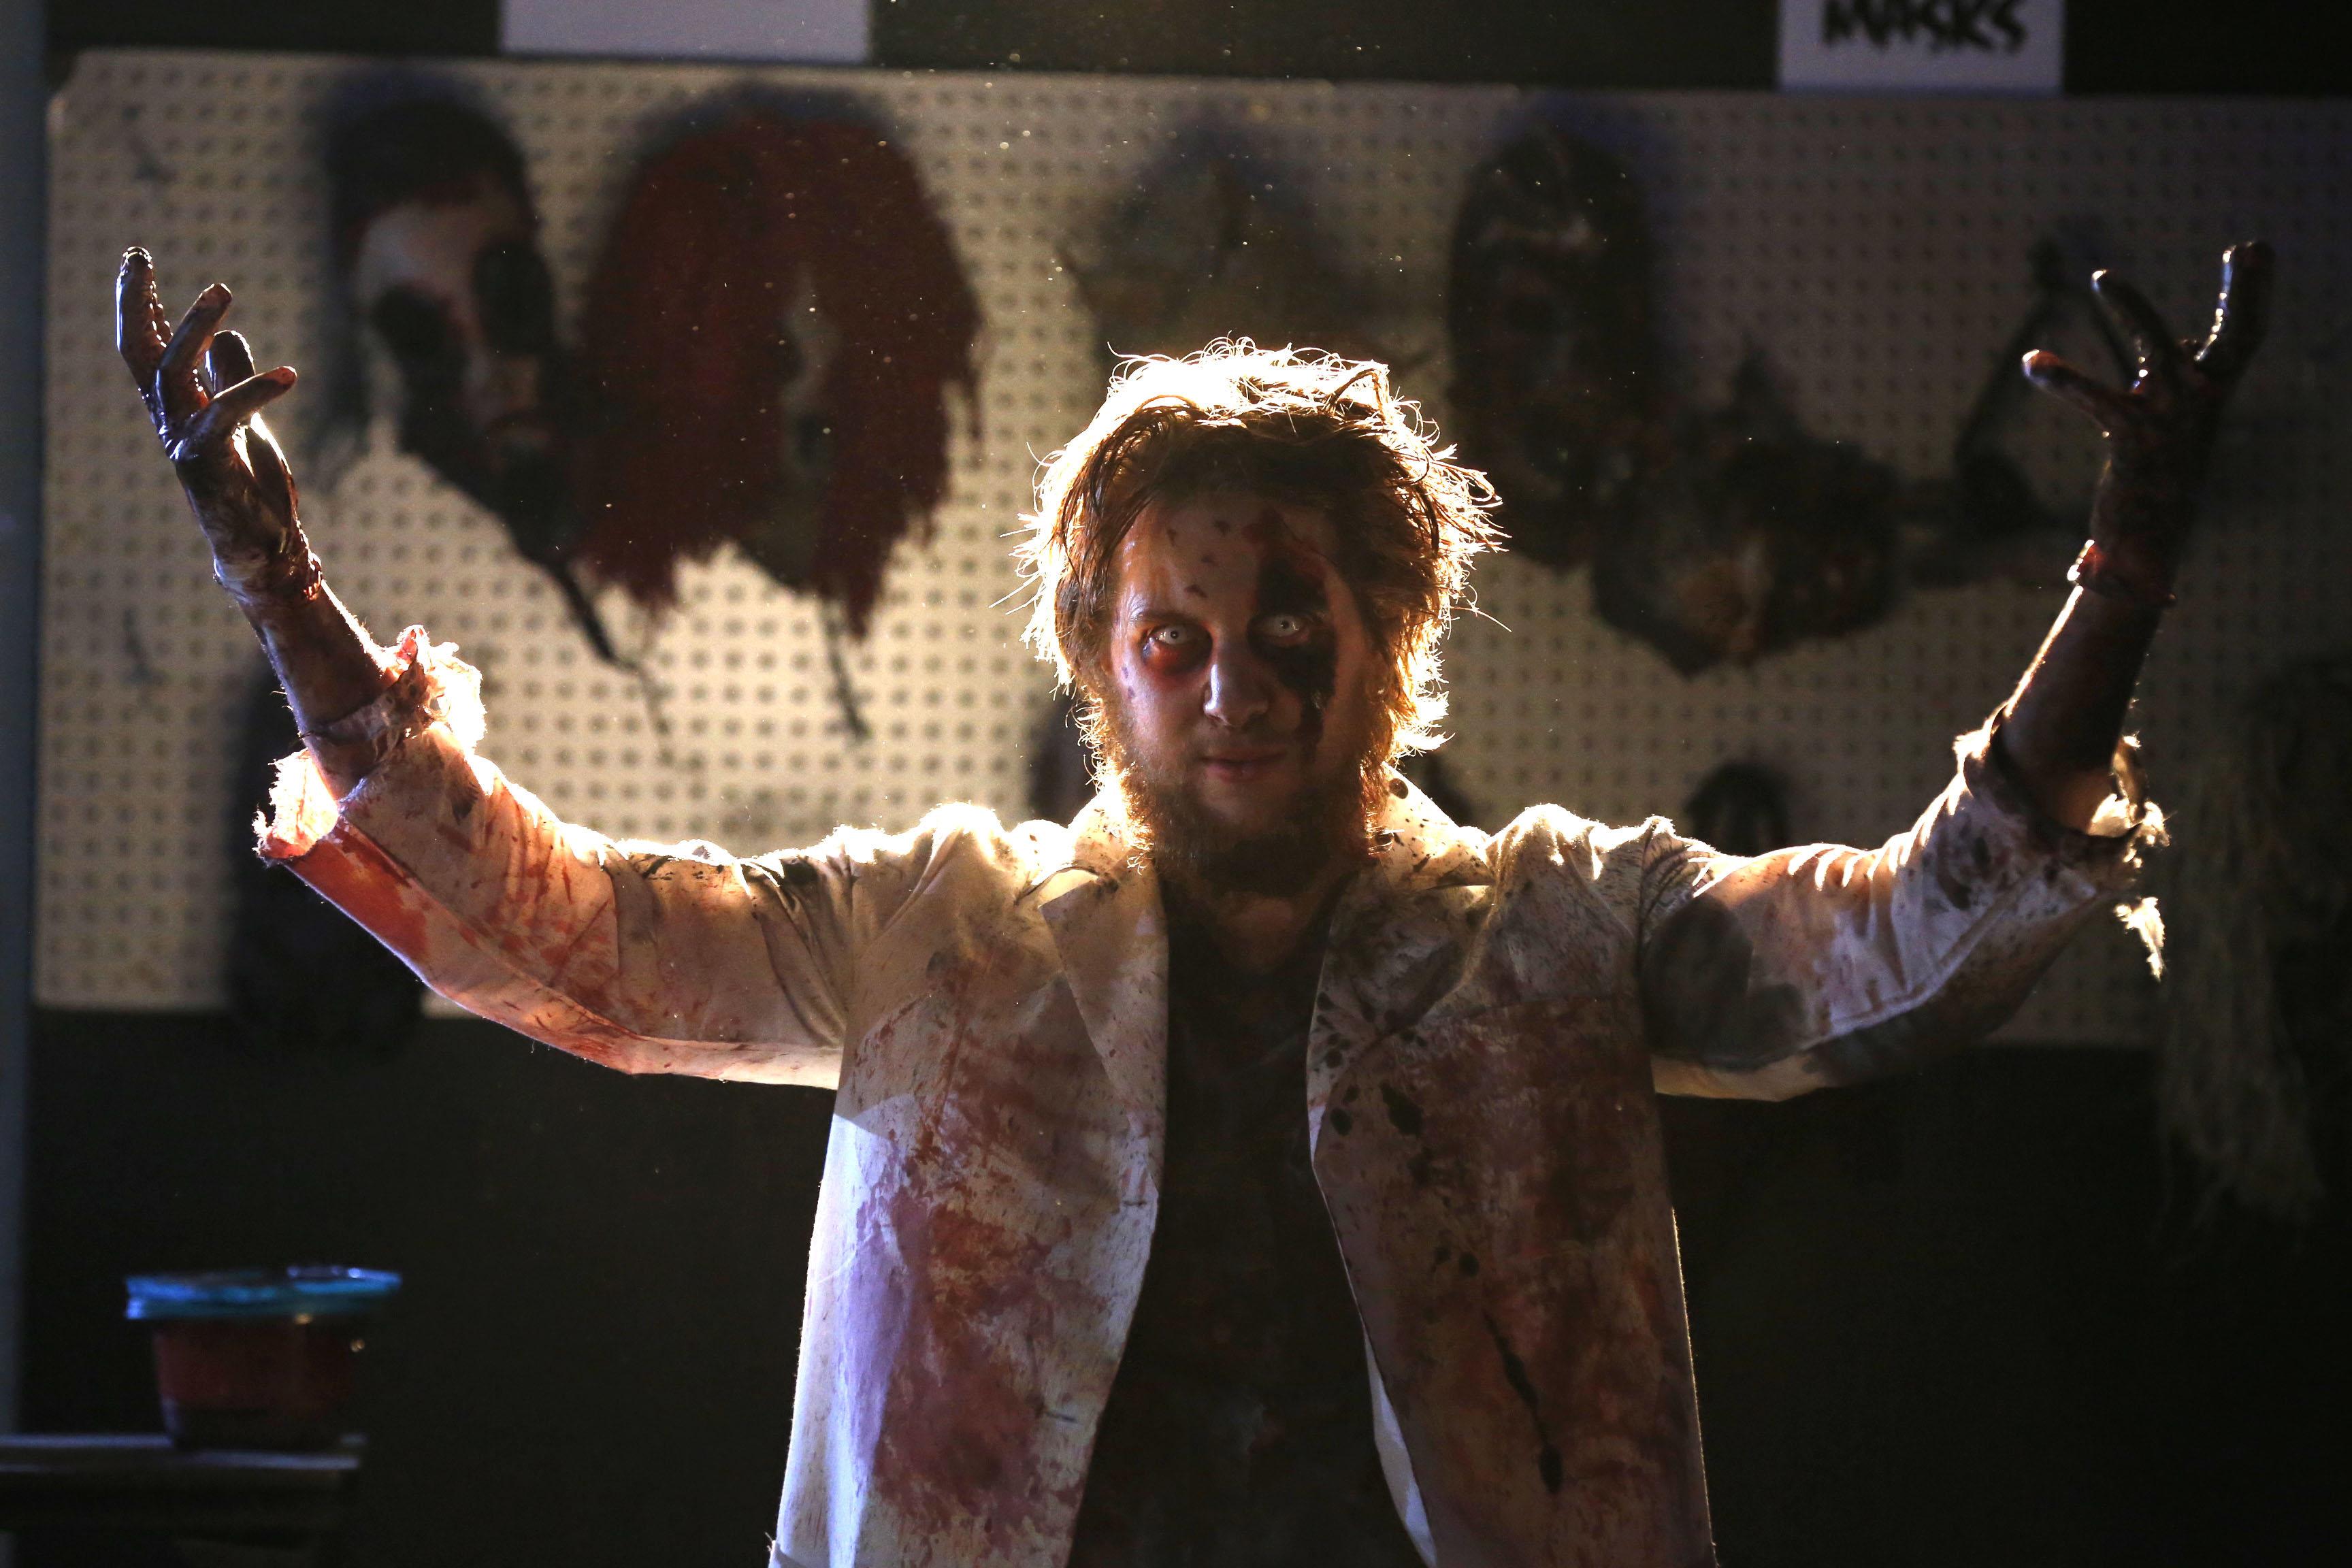 Bobby Weber, of Lockport, one of the scare actors at Frightworld in Tonawanda. (Robert Kirkham/Buffalo News)